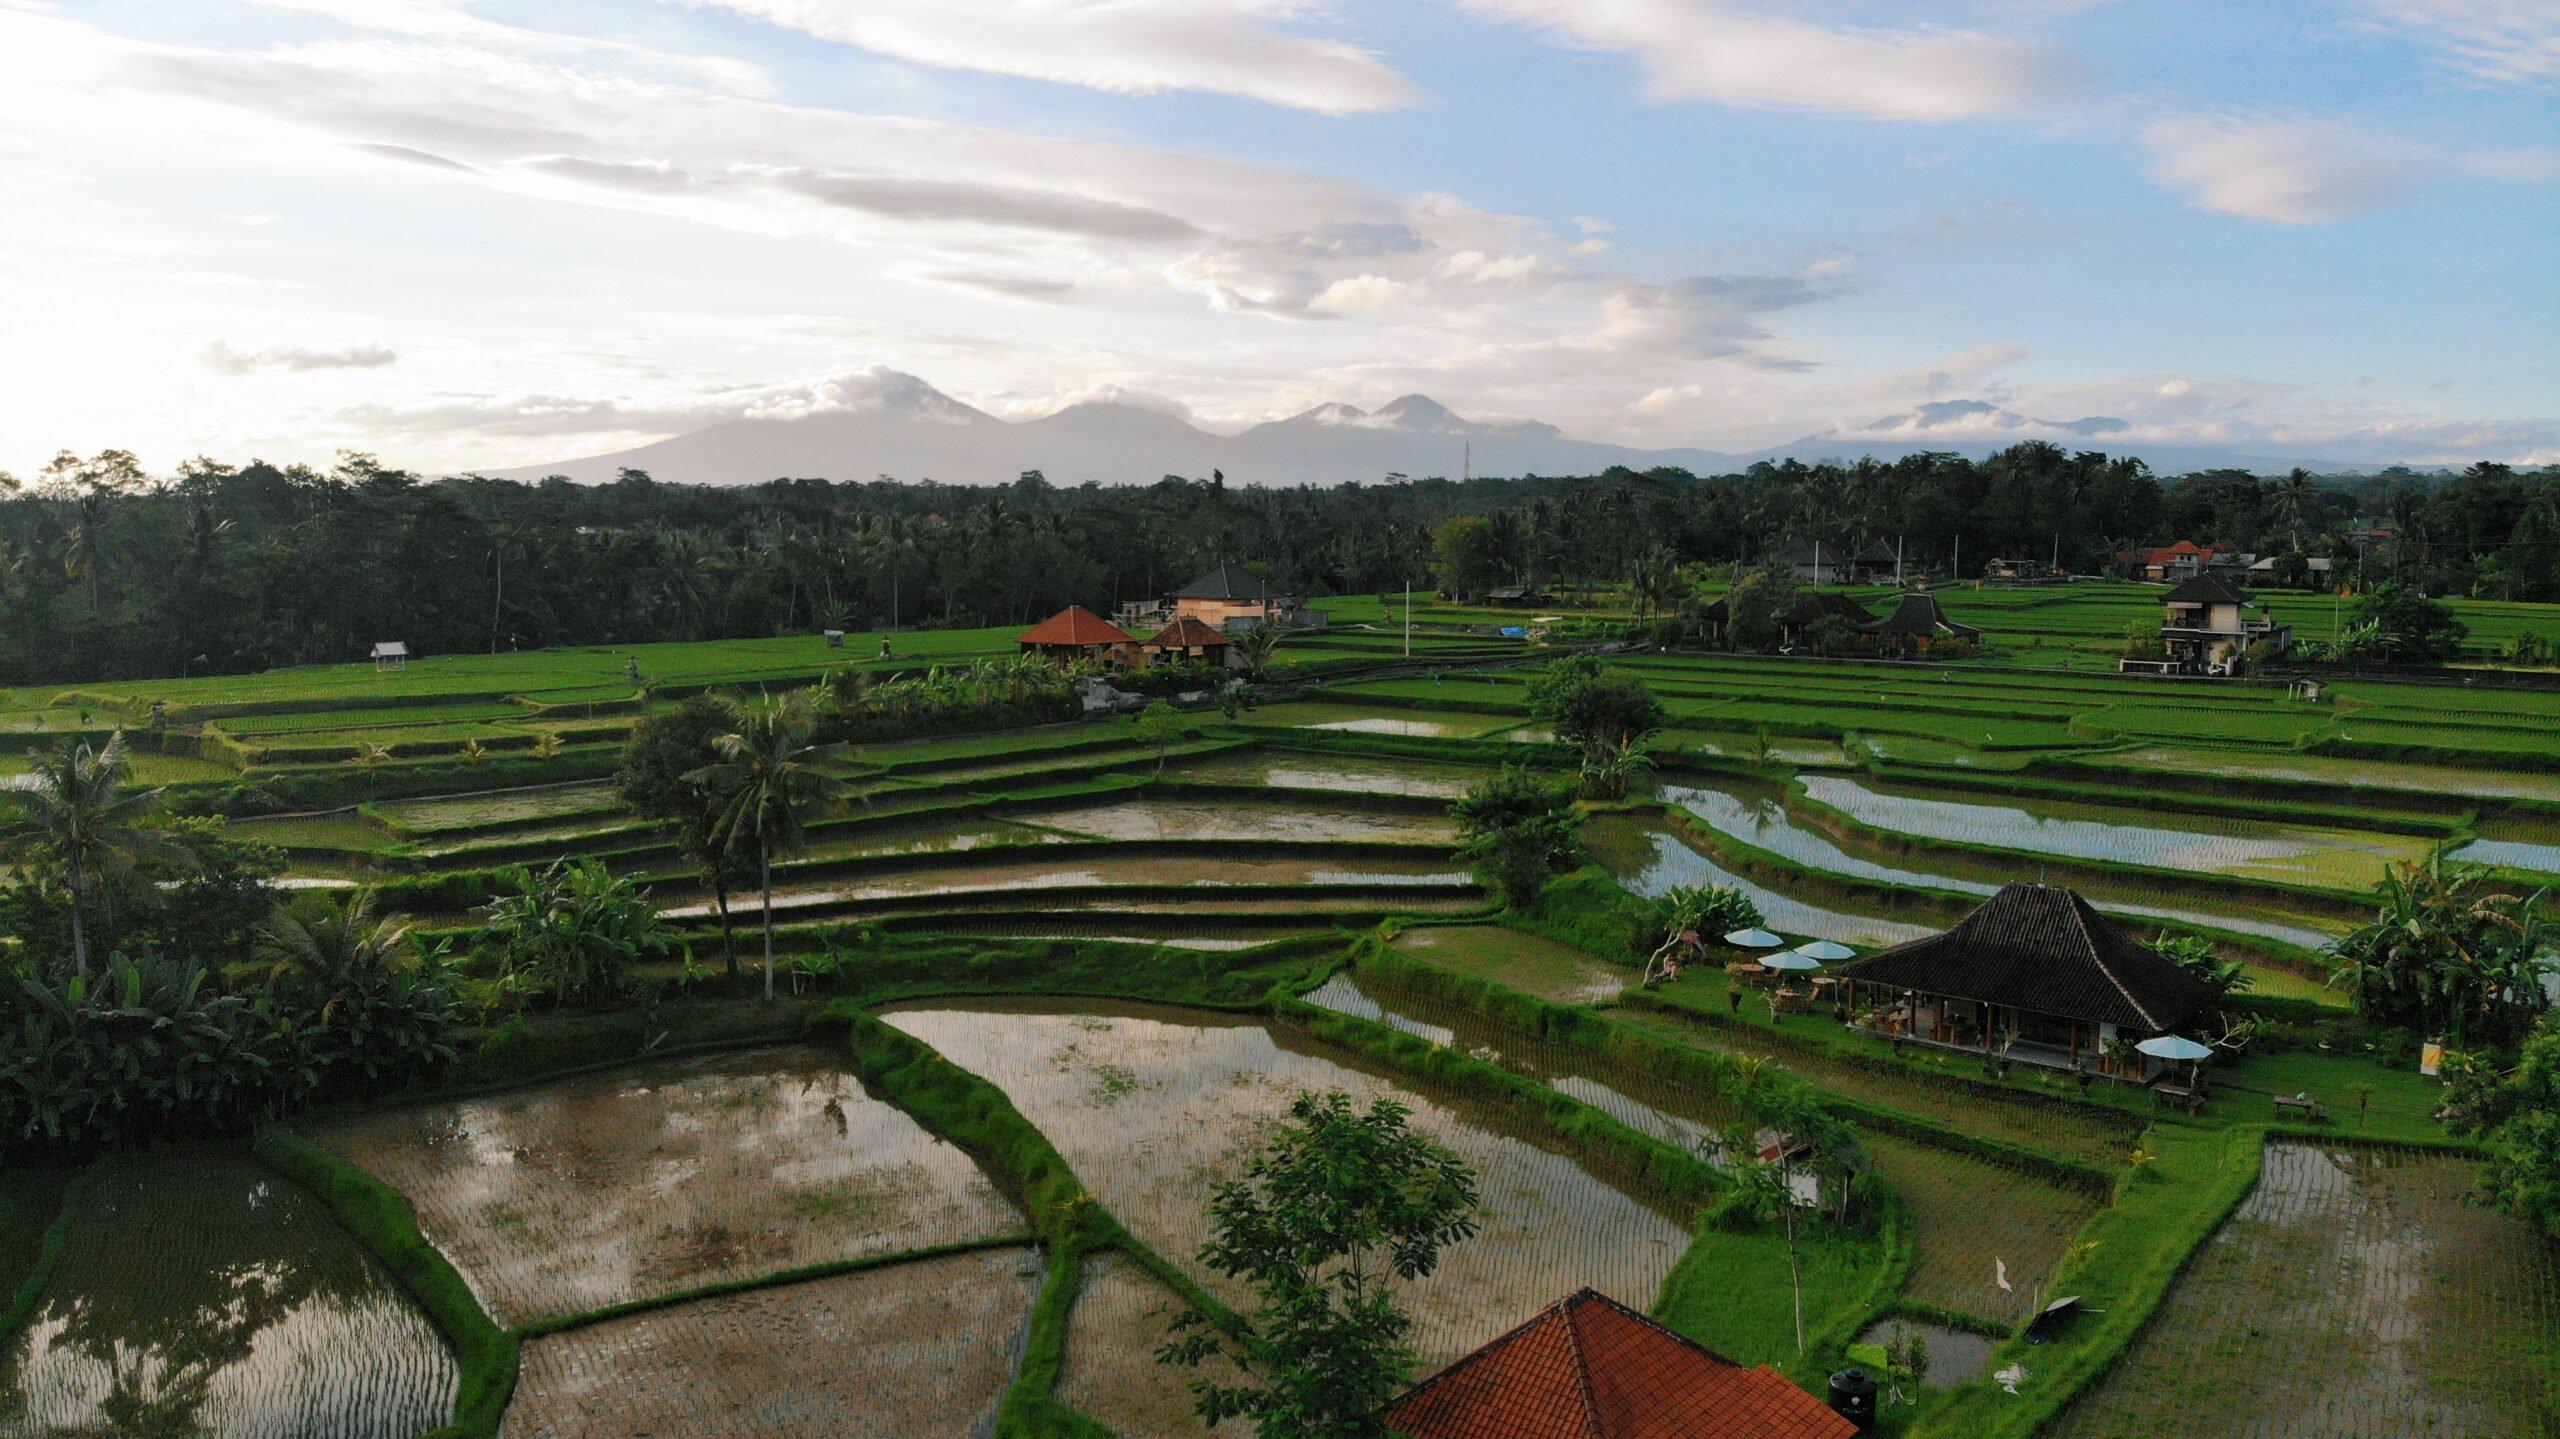 Enjoy Views Over The Rice Terraces On The Bali Atv Adventure